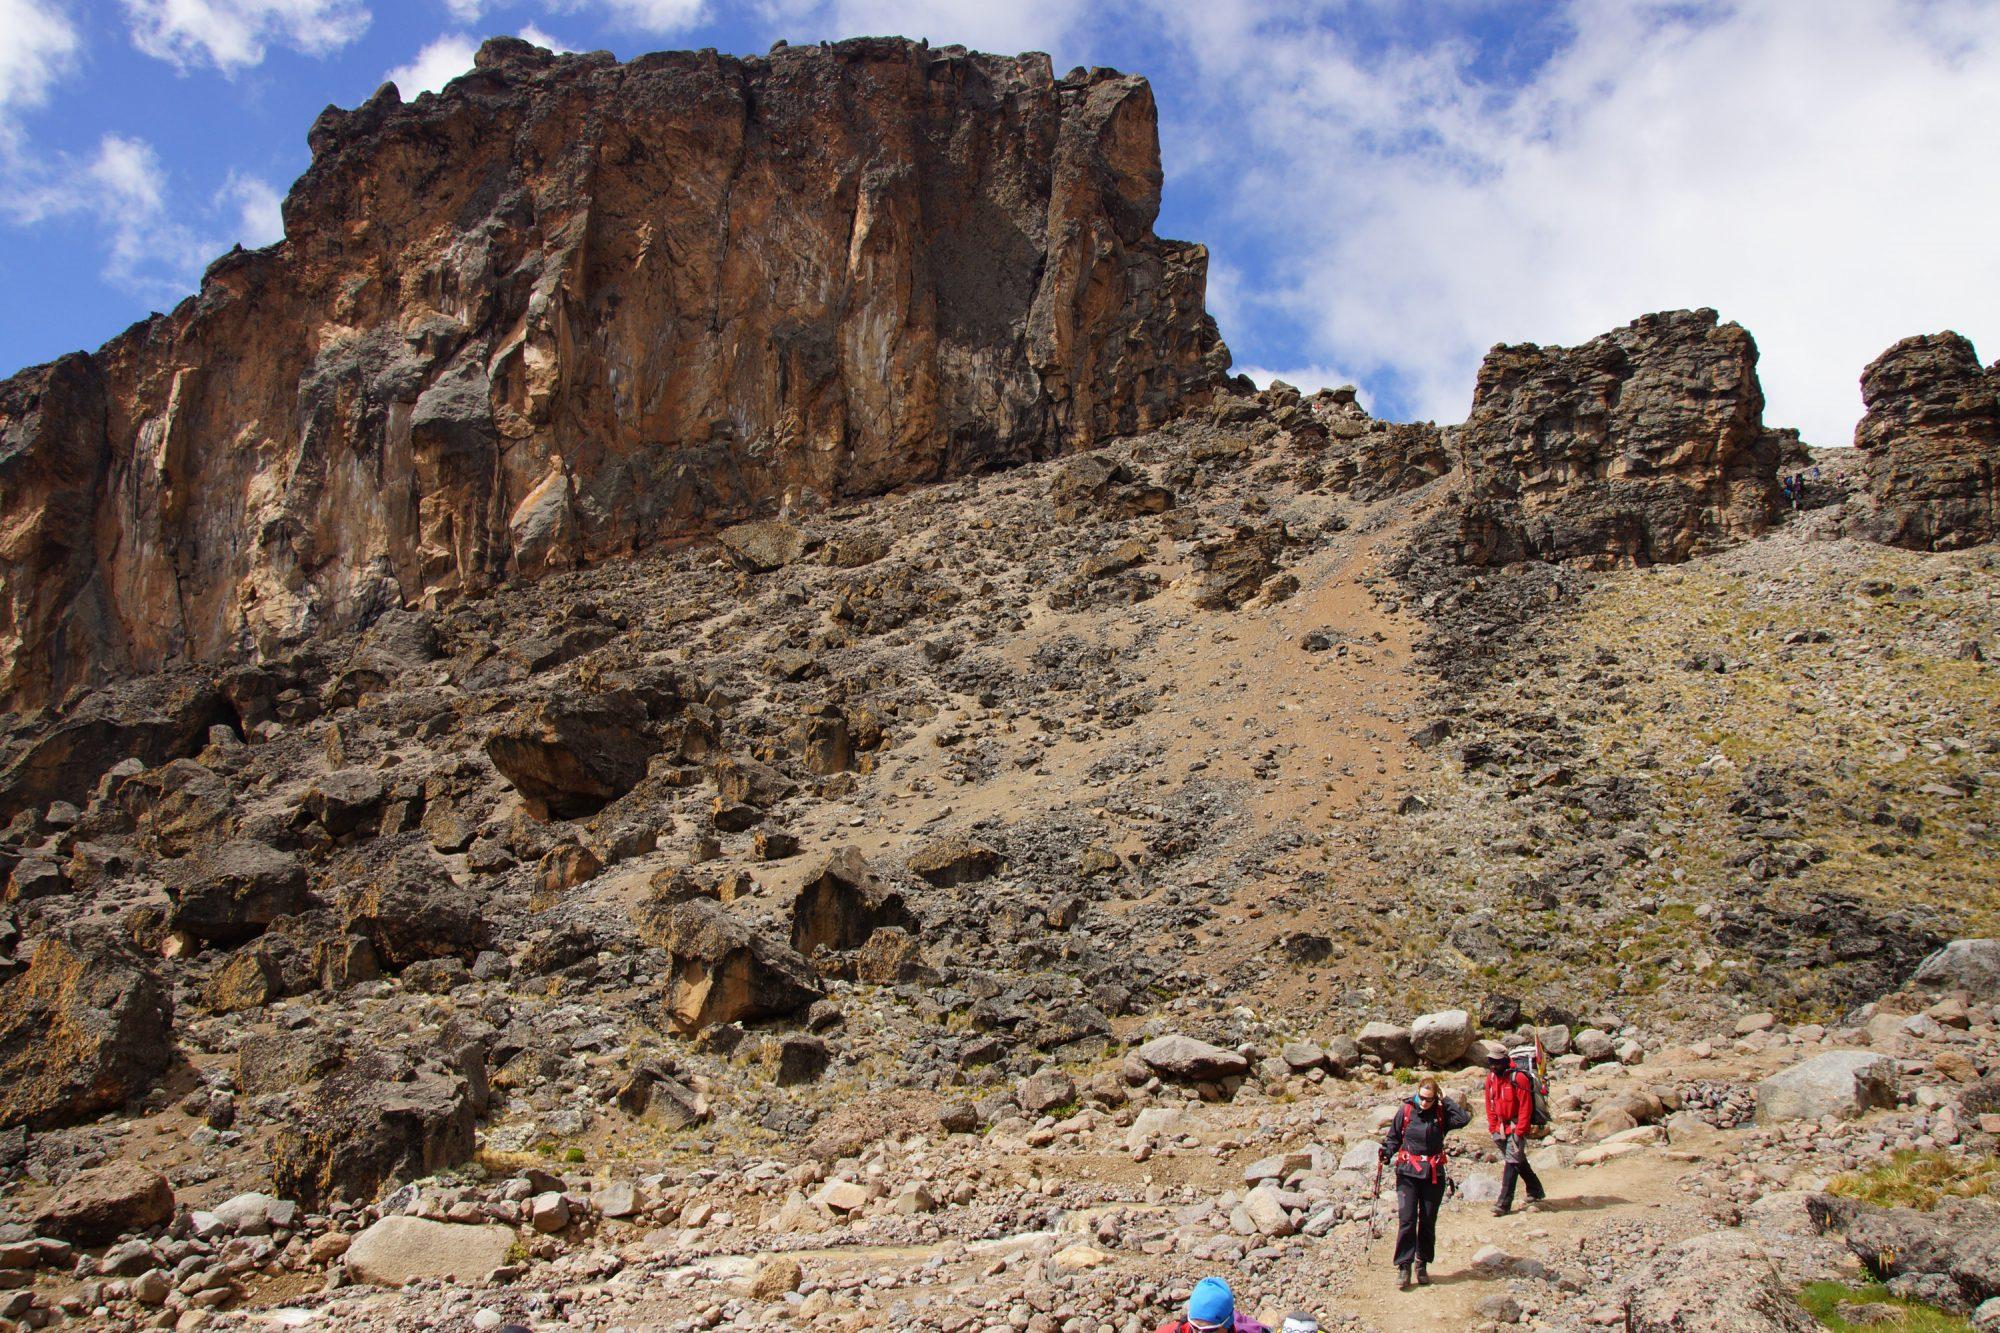 Lava Tower, Kilimandscharo, Kilimandscharo besteigen, Tansania, Afrika, Kilimandscharo Tour, Erfahrungsbericht, Machame Route